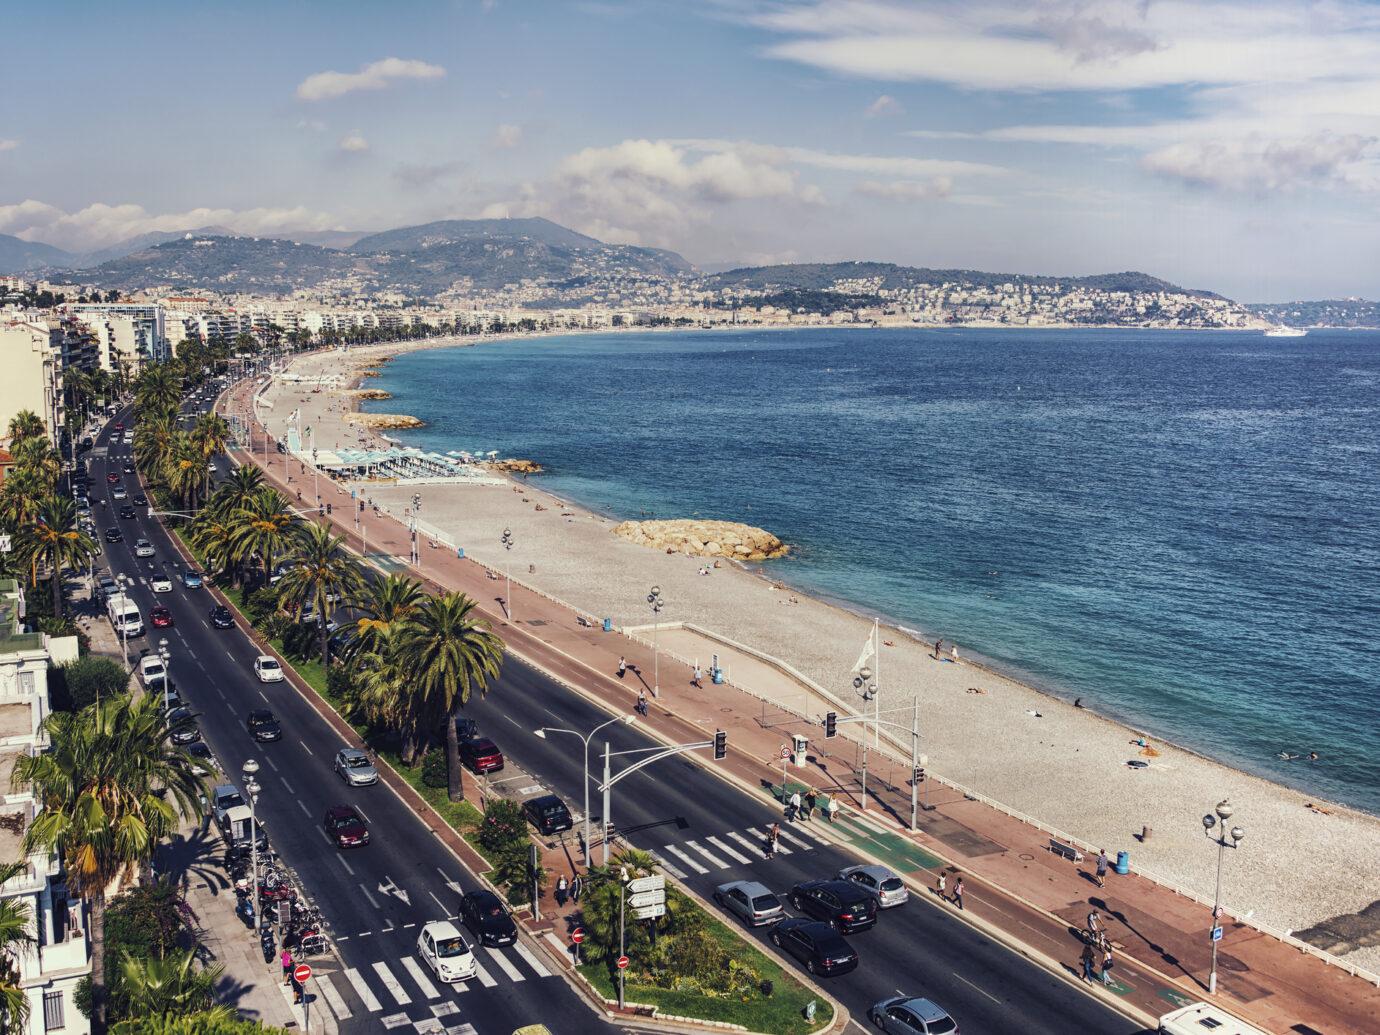 Promenade des anglais in Nice